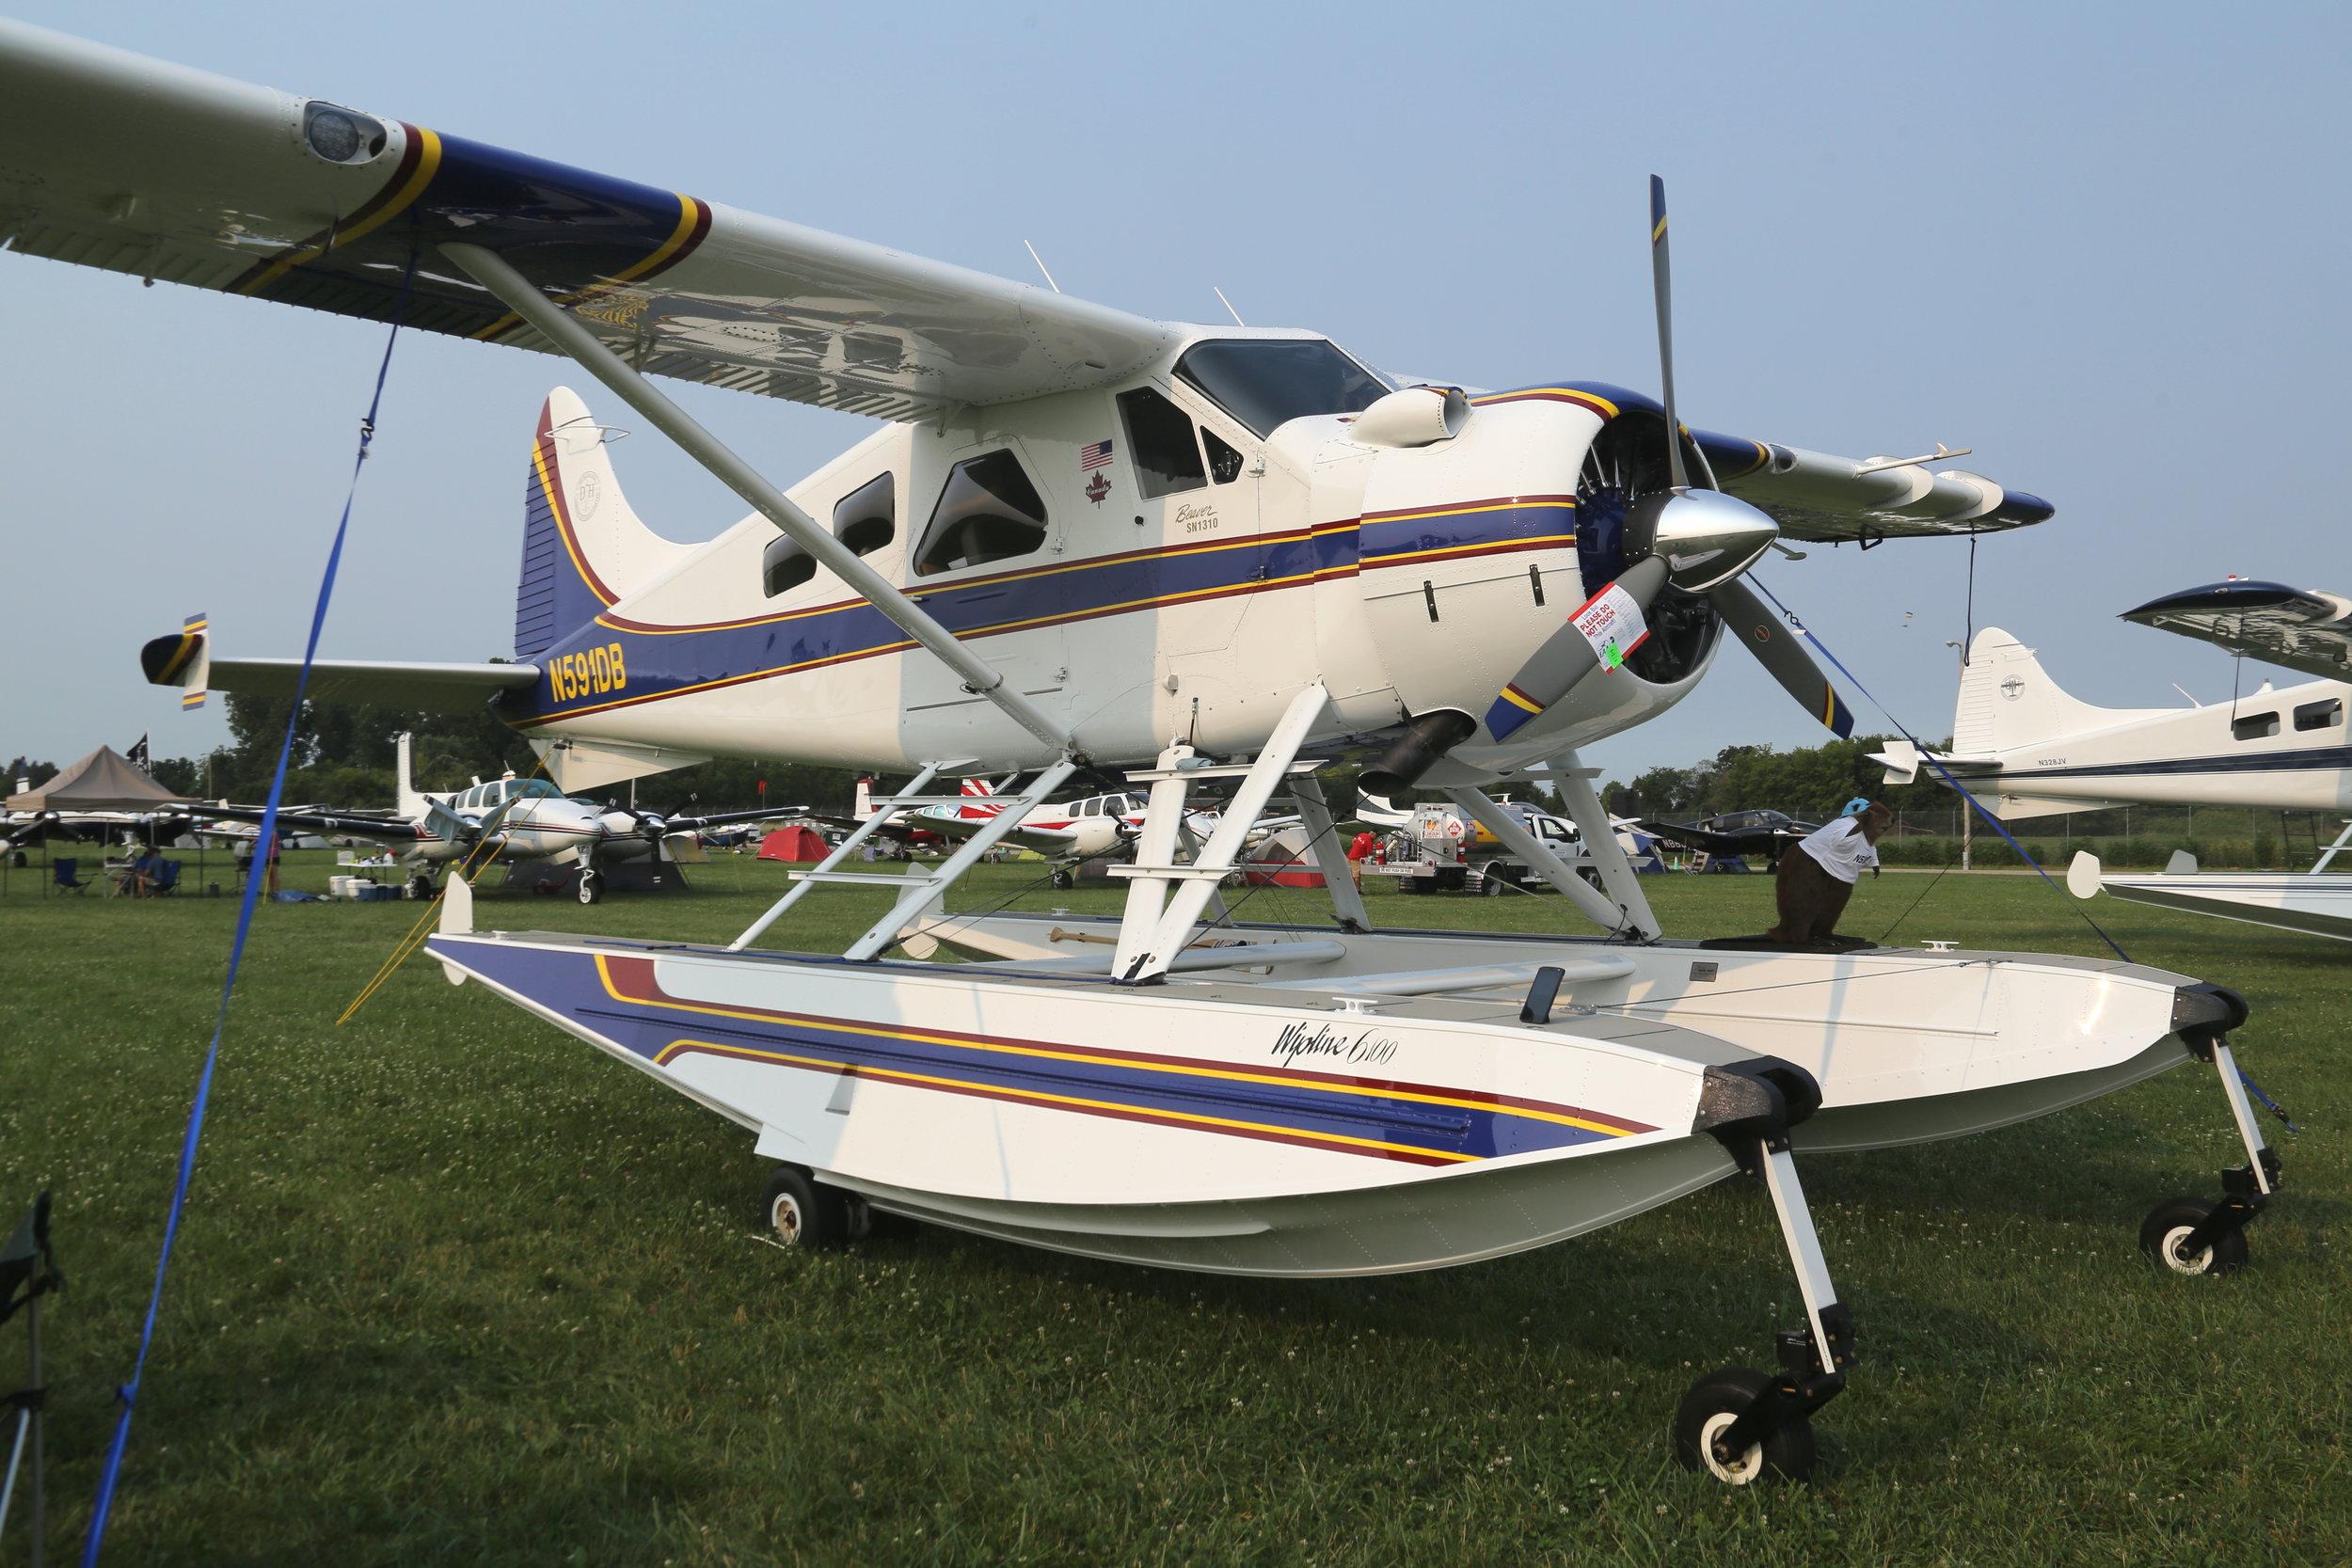 N591DB Wet Dreams DHC-2 Beaver taken at Oshkosh 23rd July 2018 by John Wood